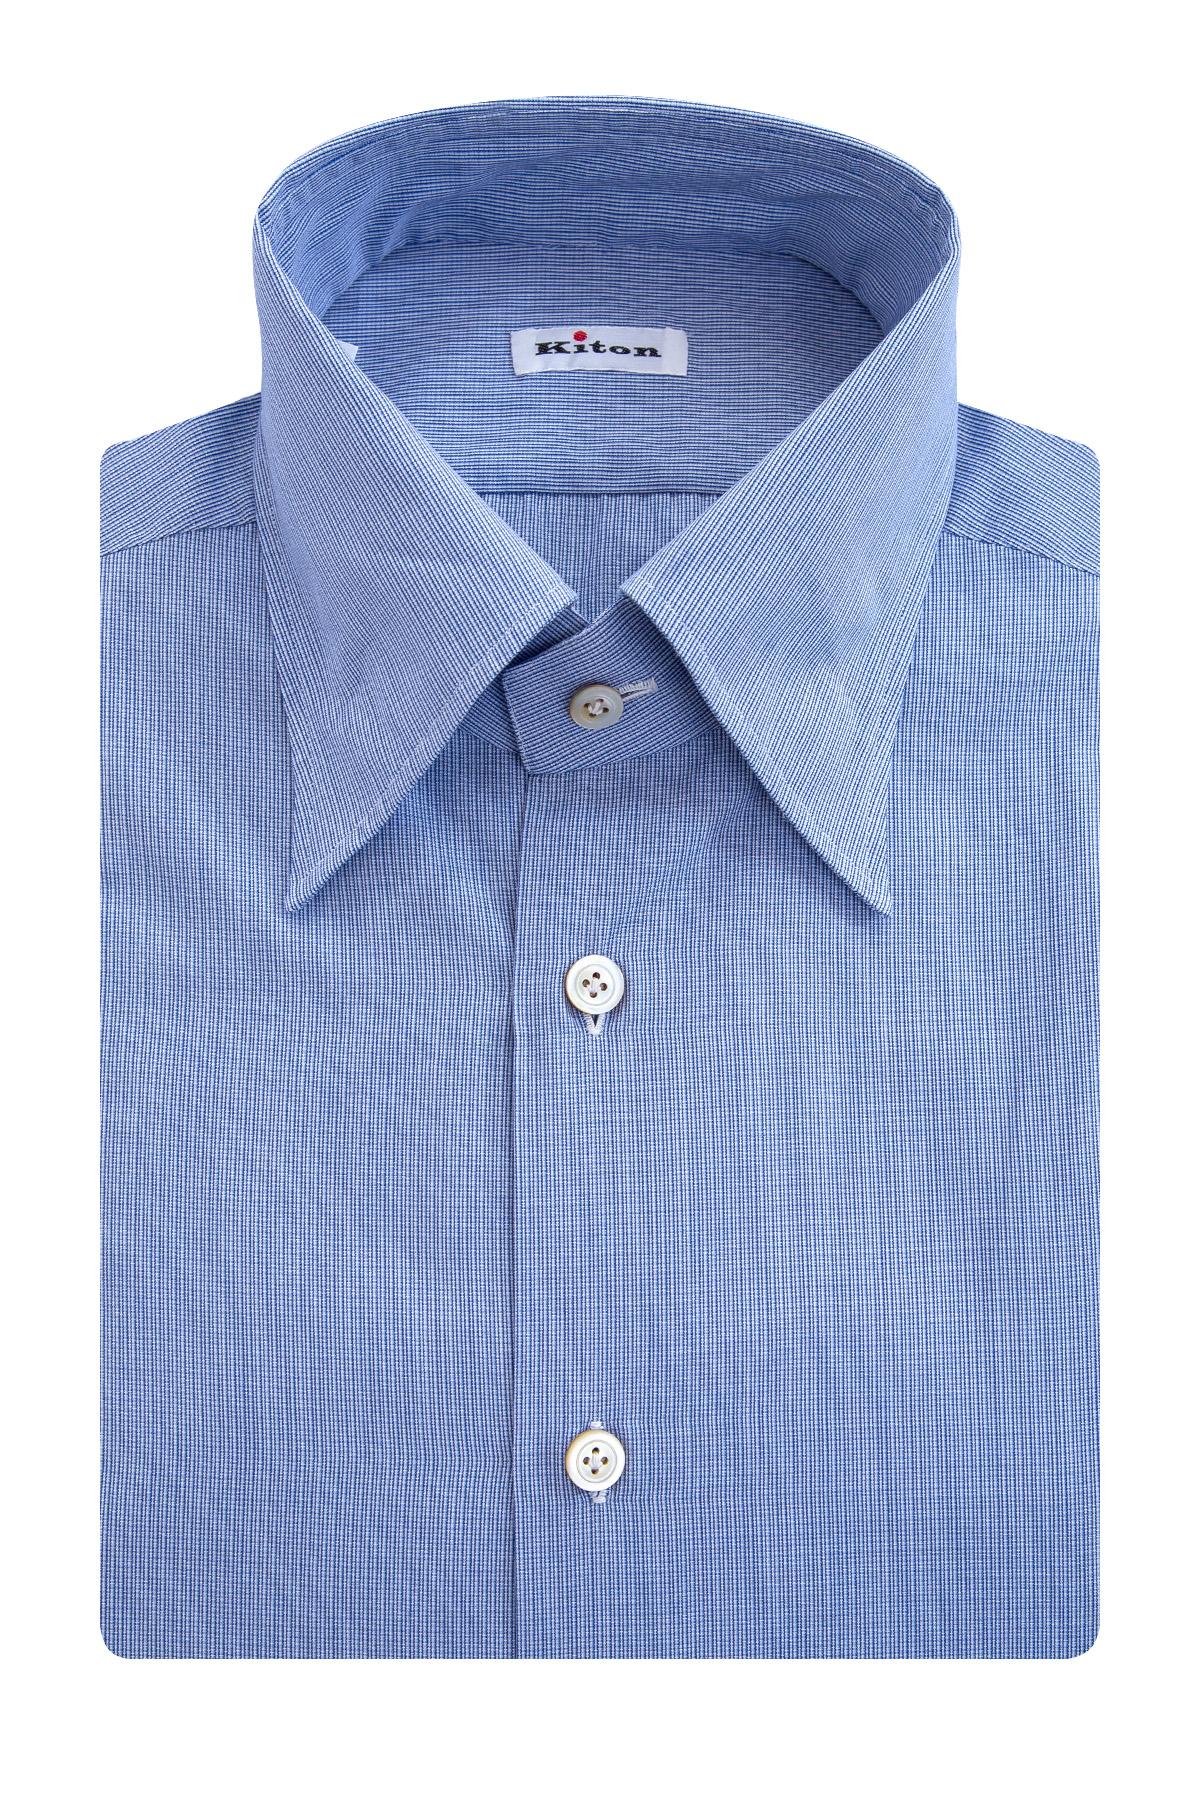 Купить Рубашка, KITON, Италия, хлопок 100%